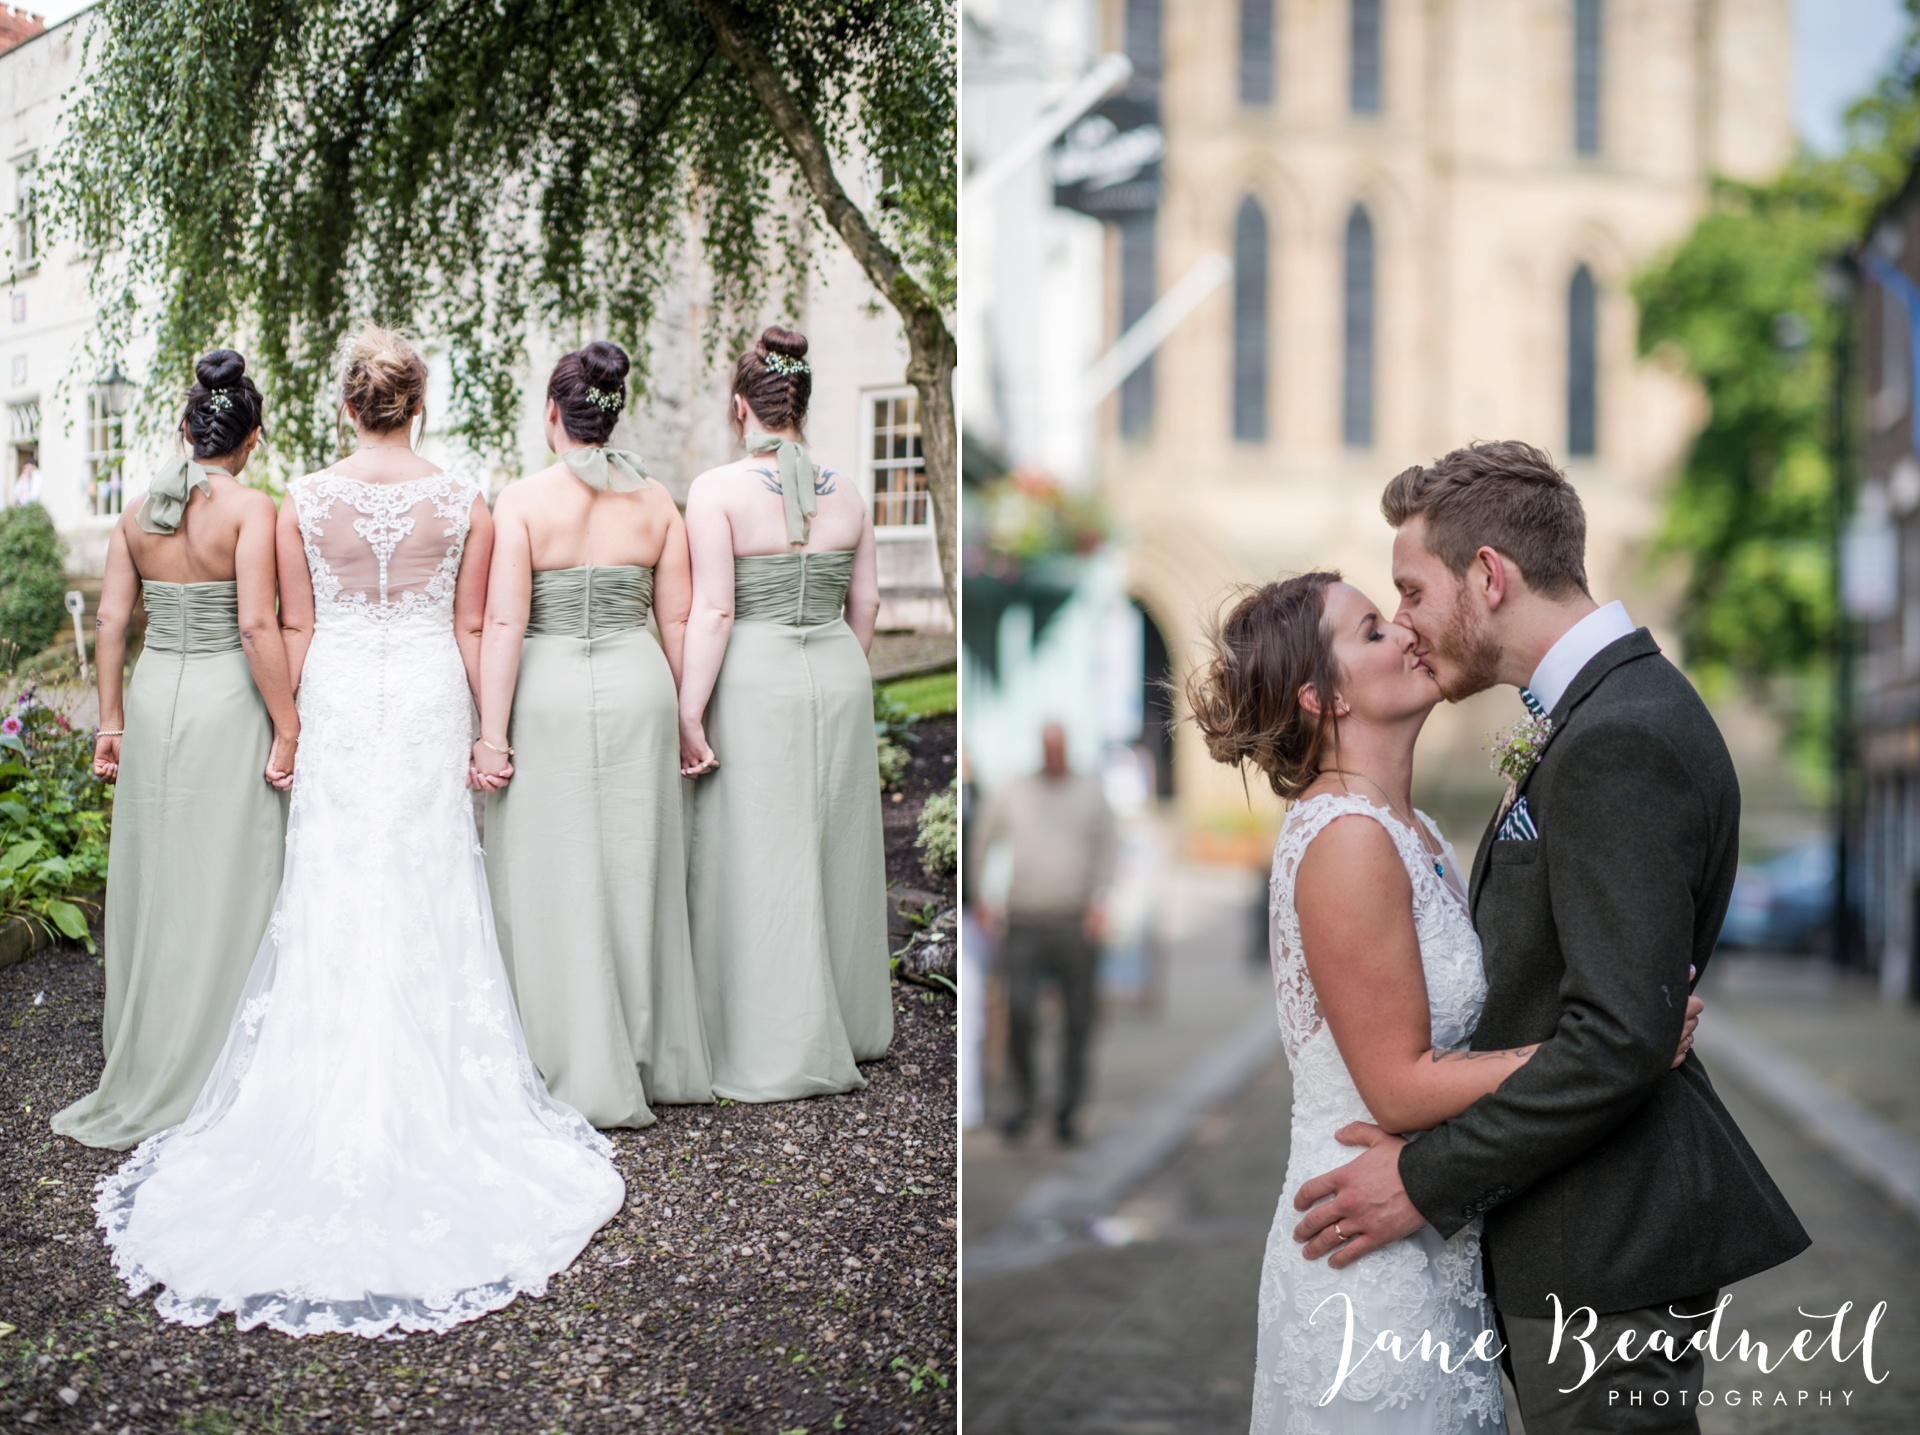 Jane Beadnell fine art wedding photographer The Old Deanery Ripon_0098